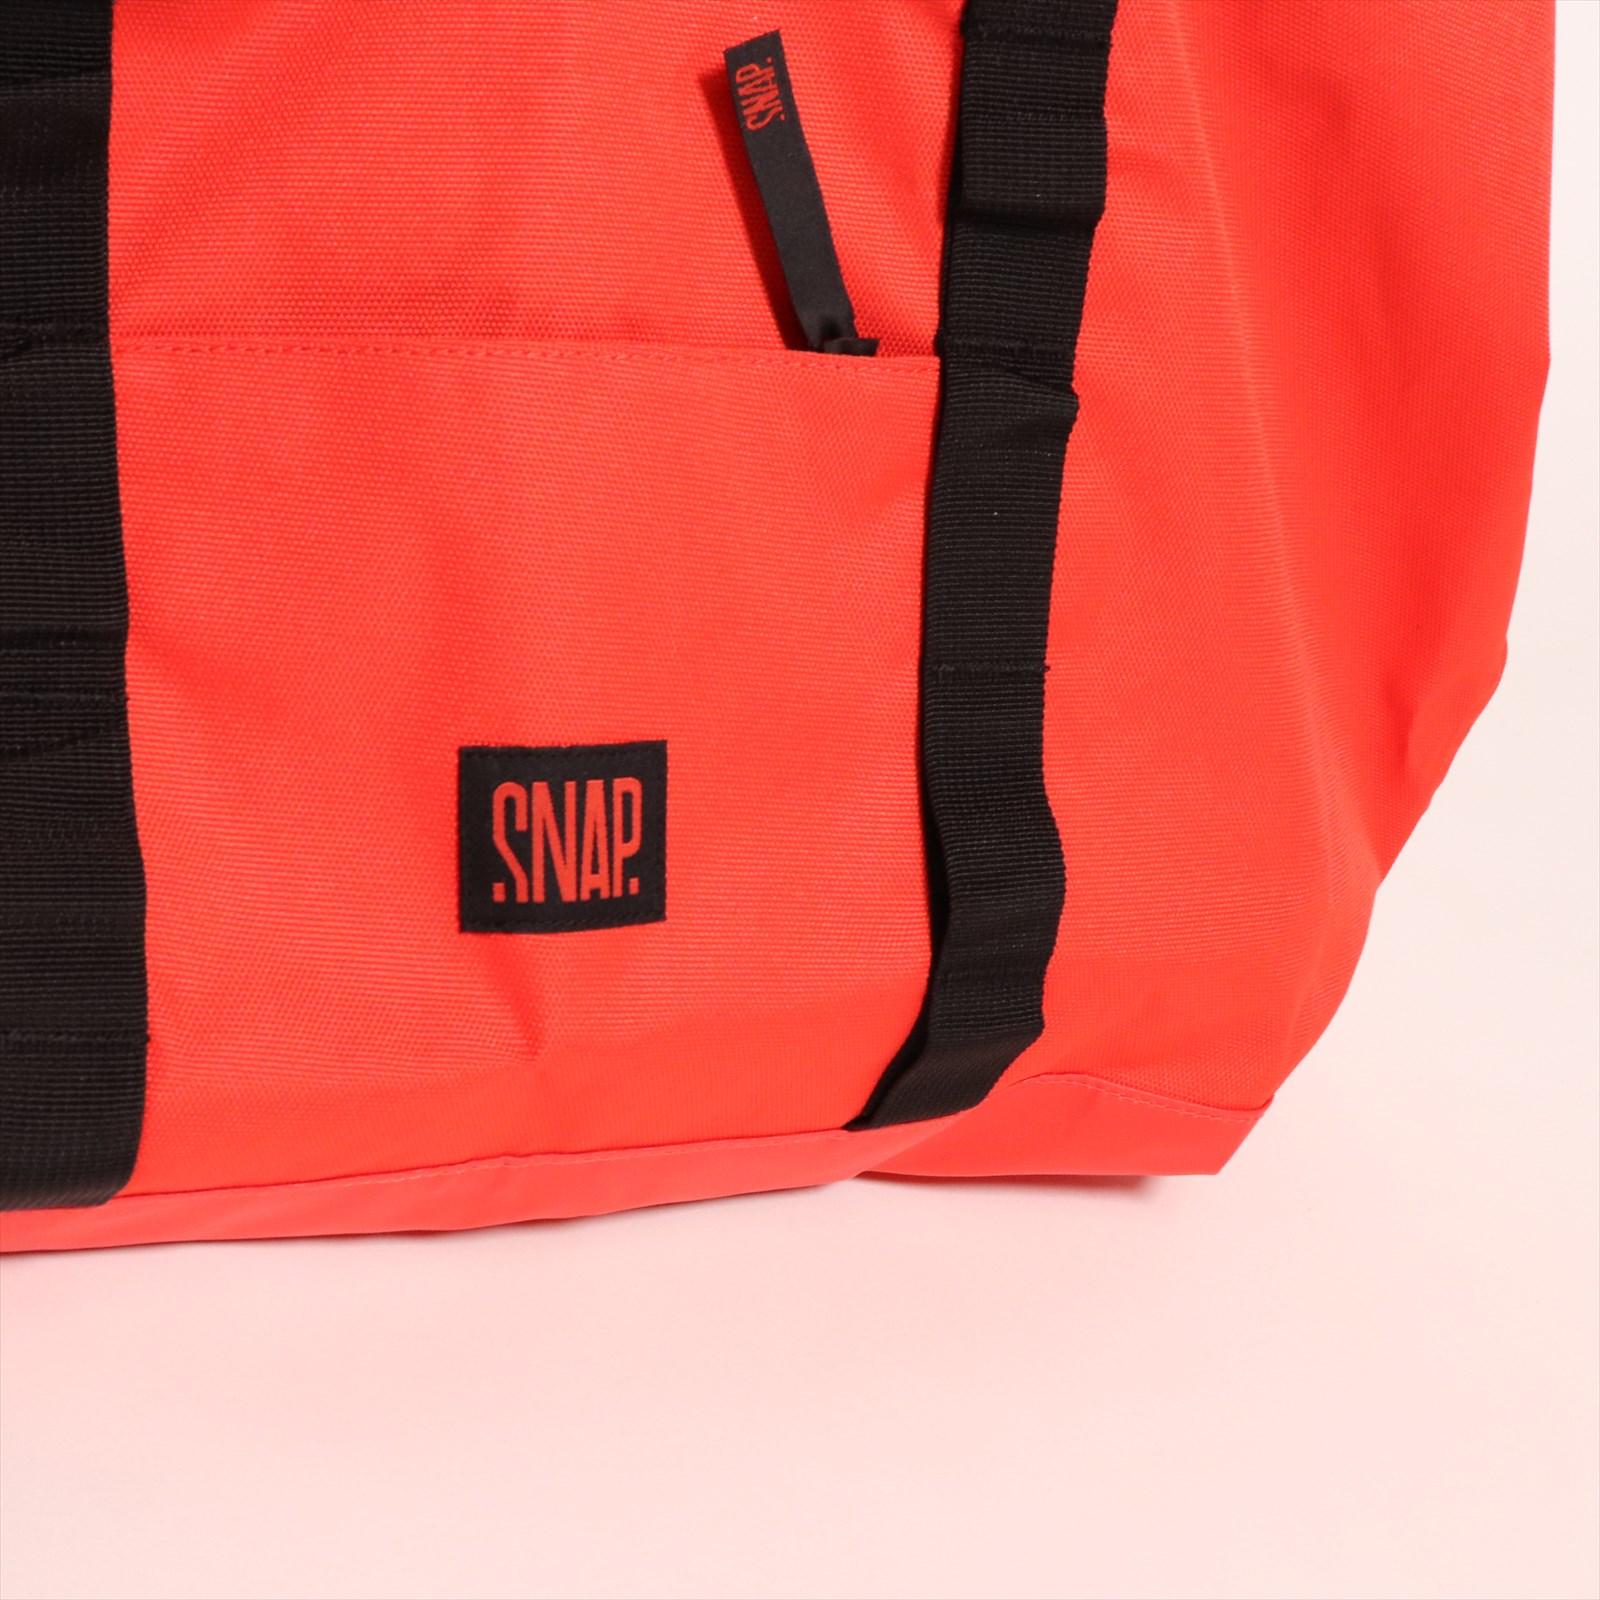 SNAP スナップ Gear Tote 35ℓ Grenadine